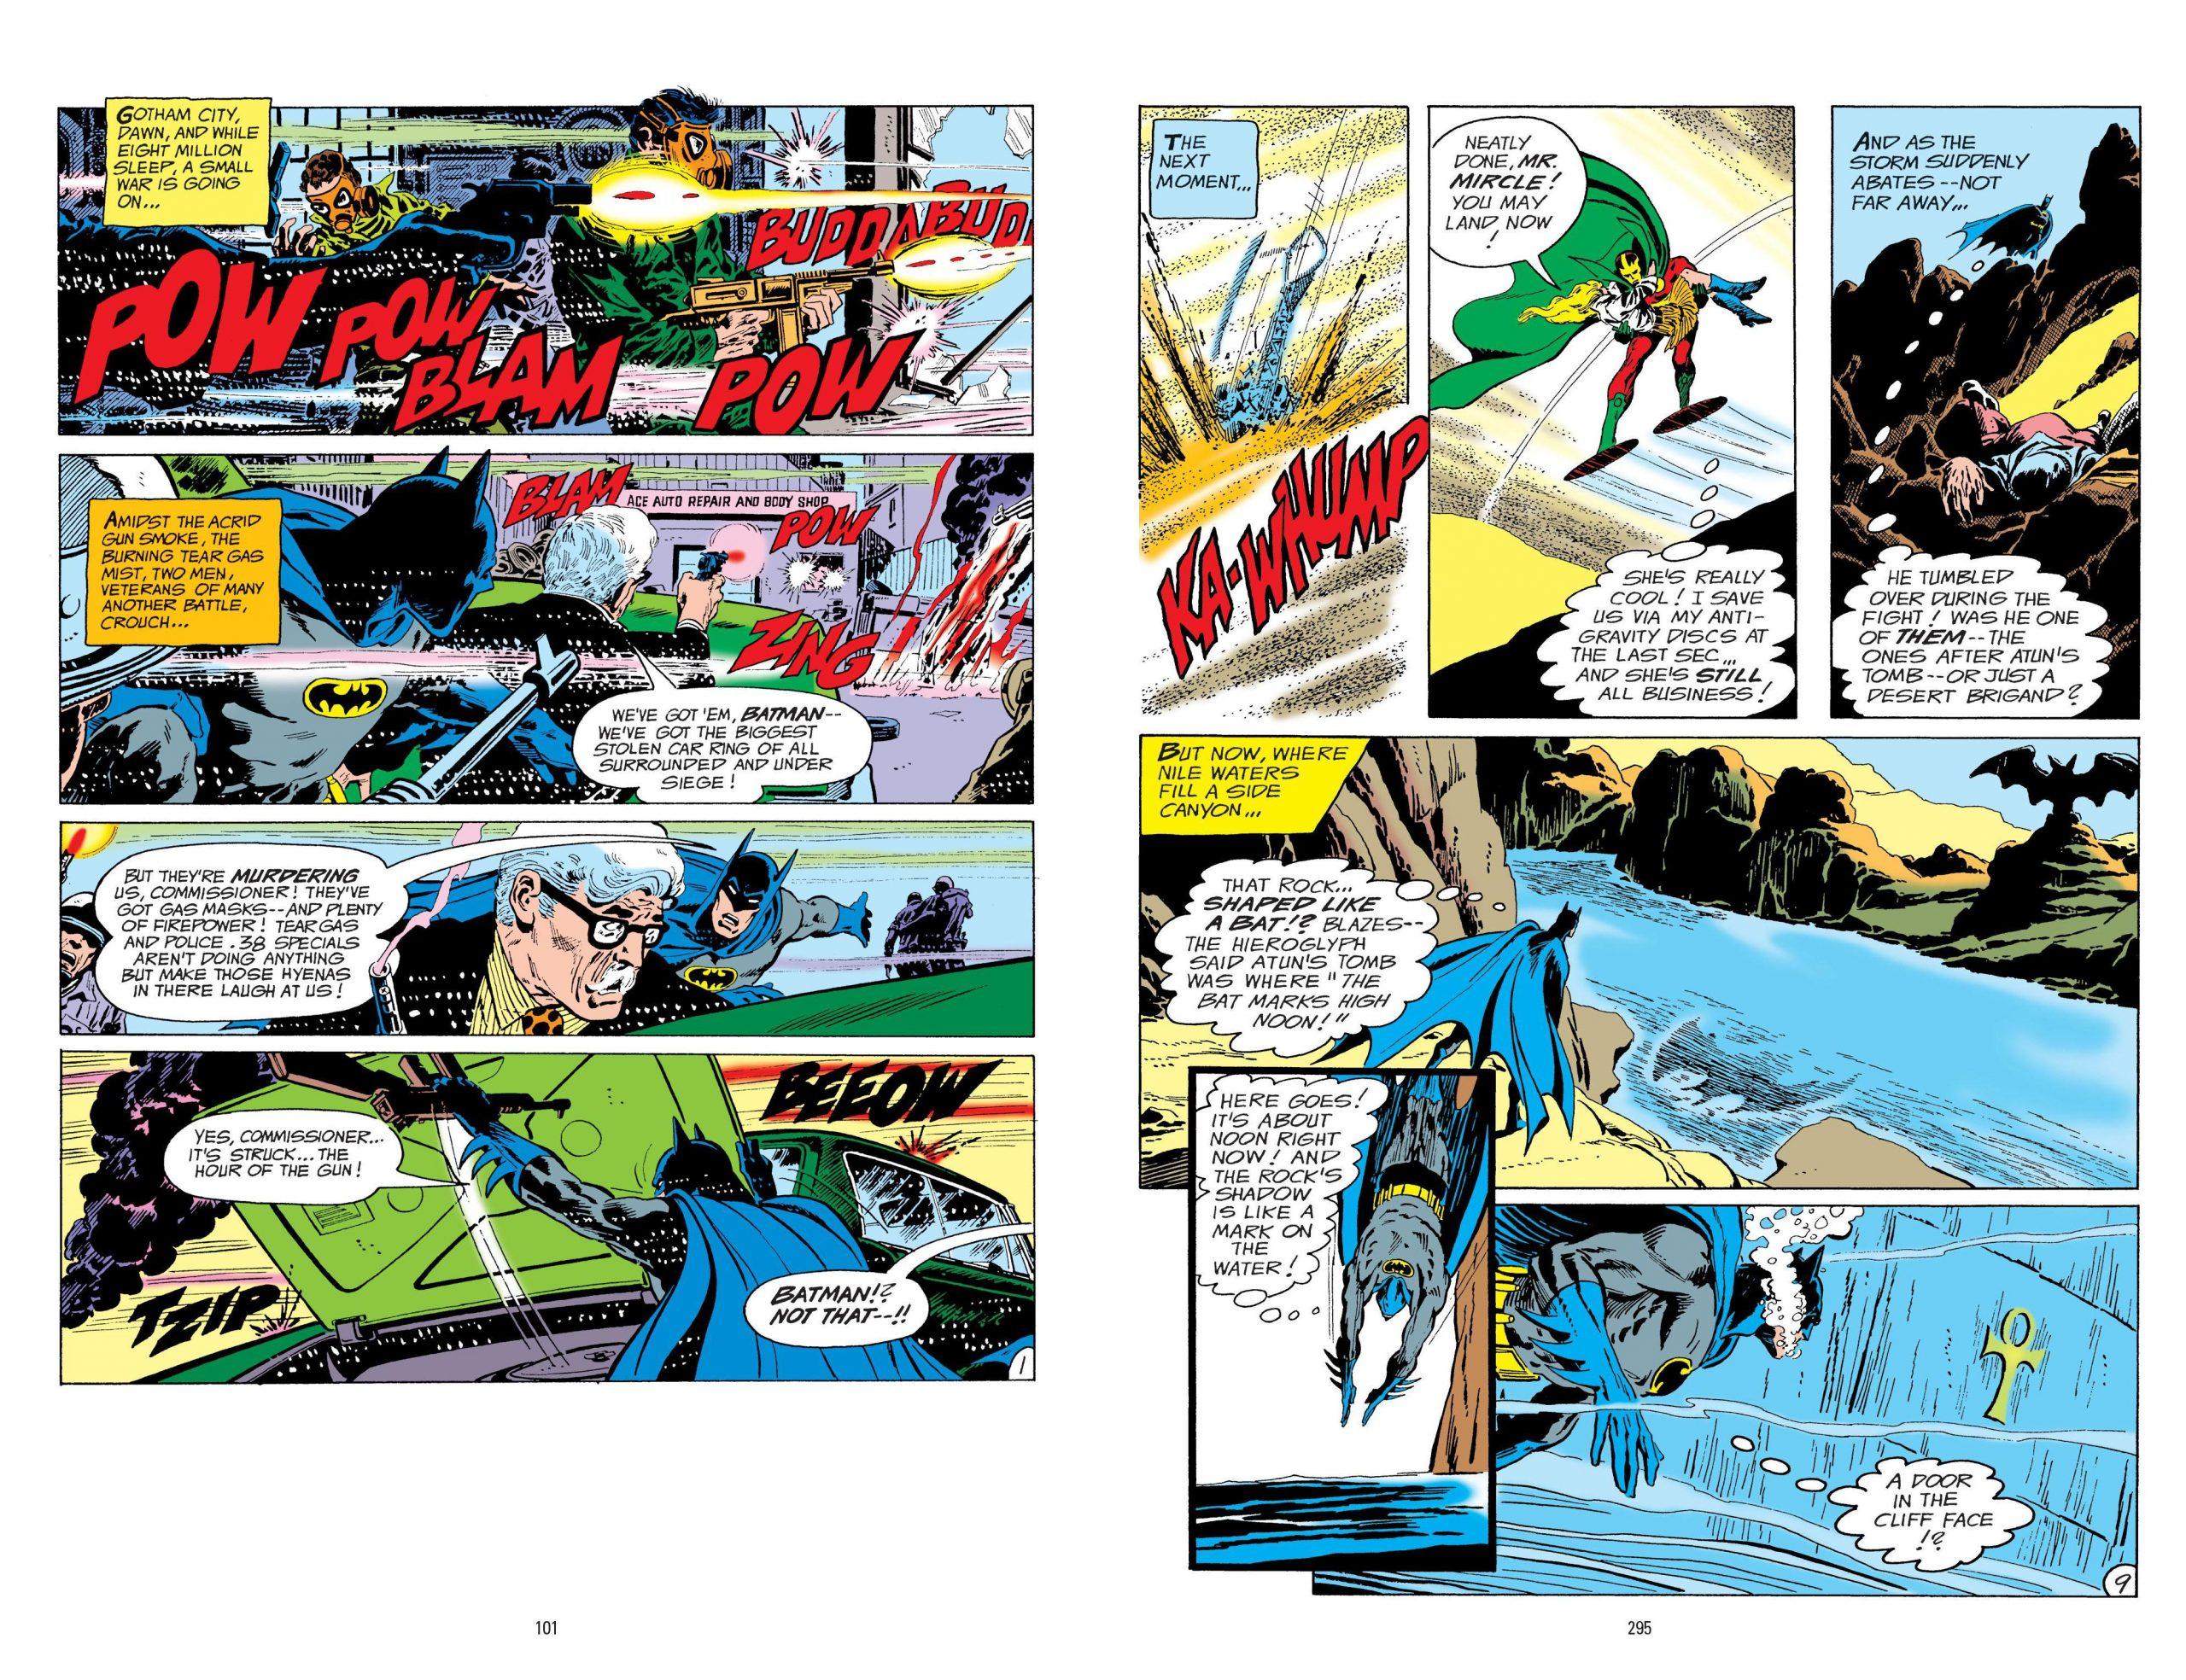 Legends of the Dark Knight - Jim Aparo Volume 1 review